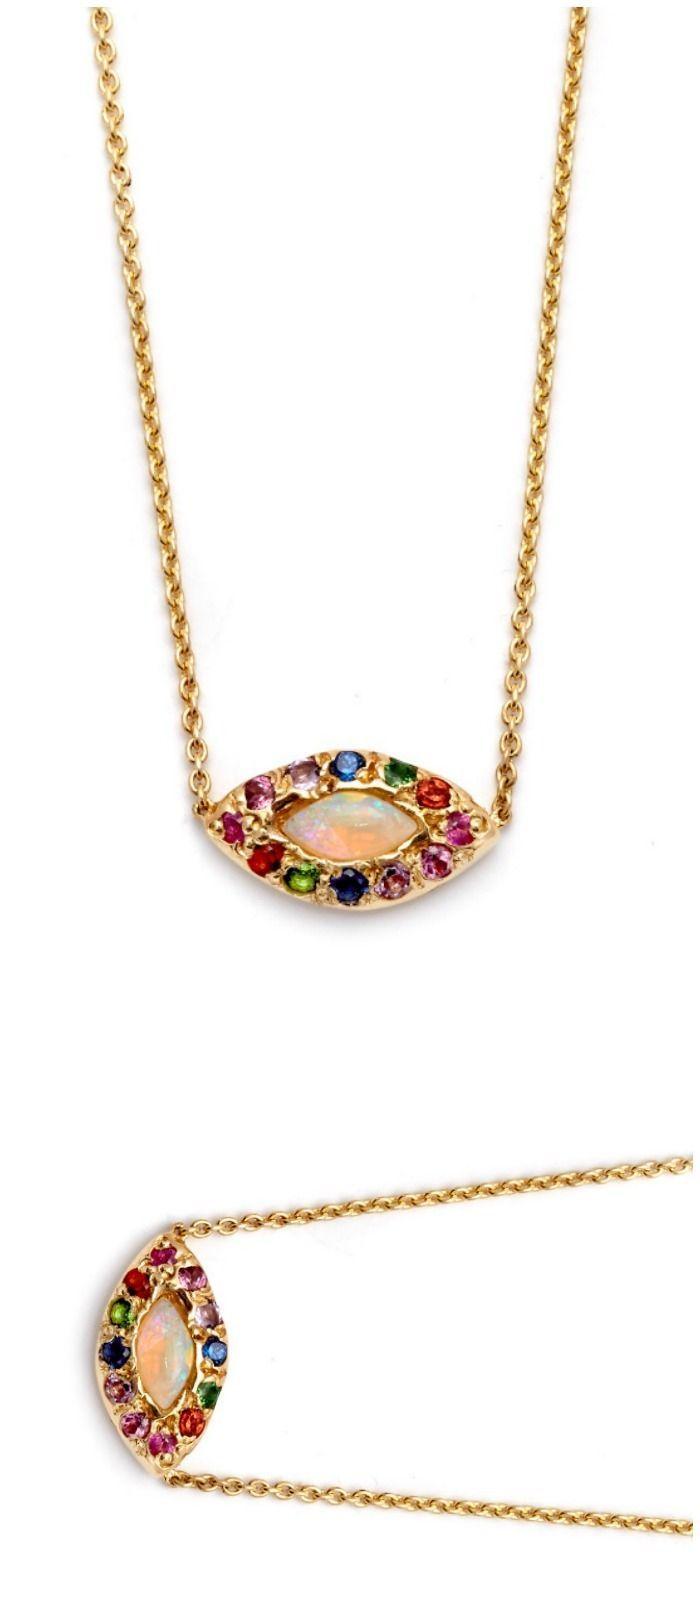 The beautiful opal eye necklace by Elisa Solomon. Featuring a lovely little opal...